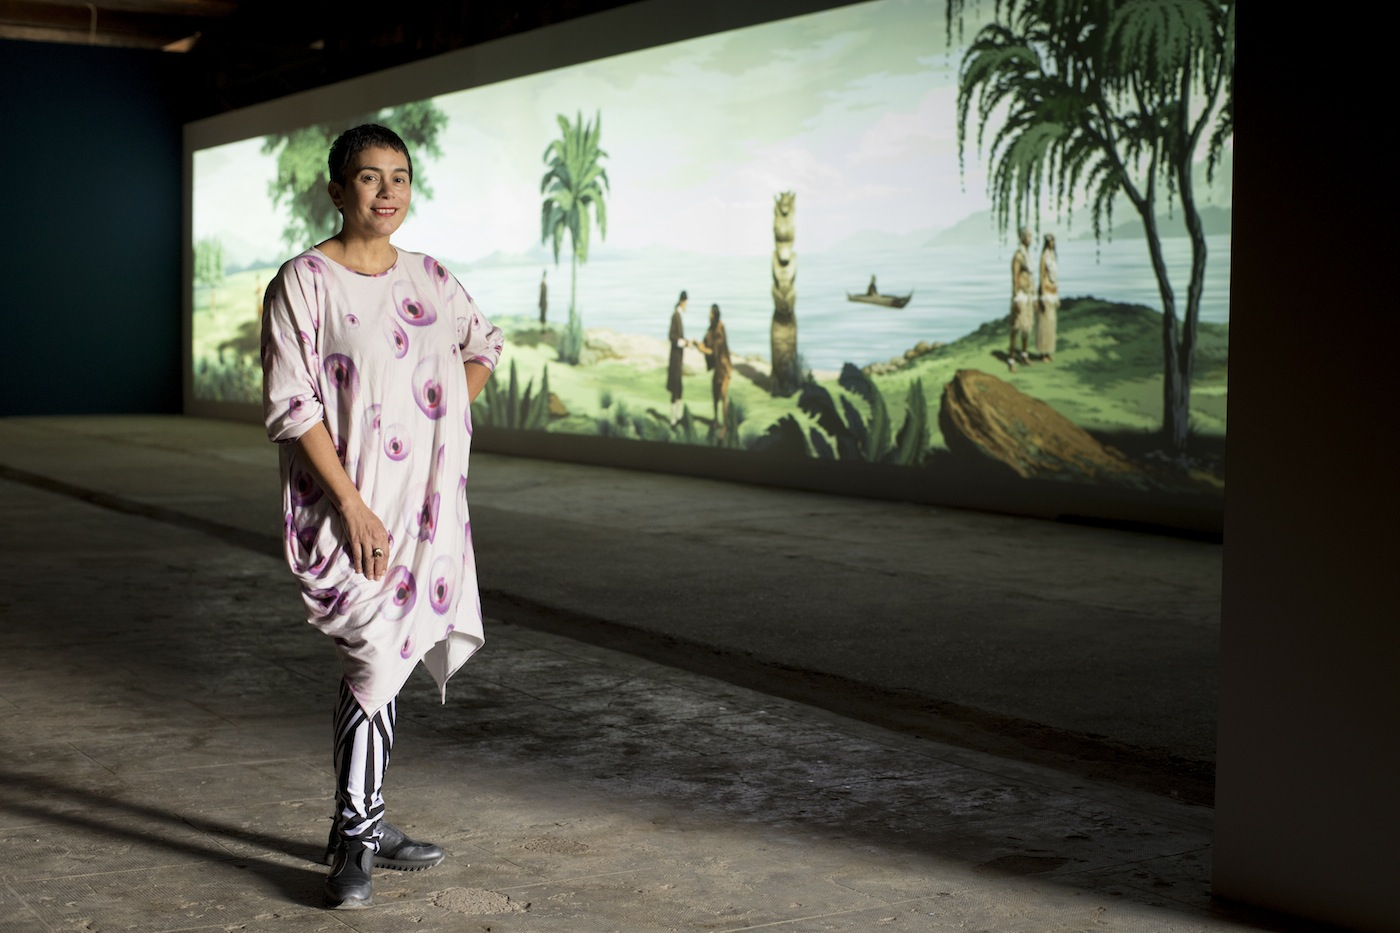 Lisa Reihana. Biennale Arte 2017. Foto: Michael Hall. courtesy of New Zealand at Venice